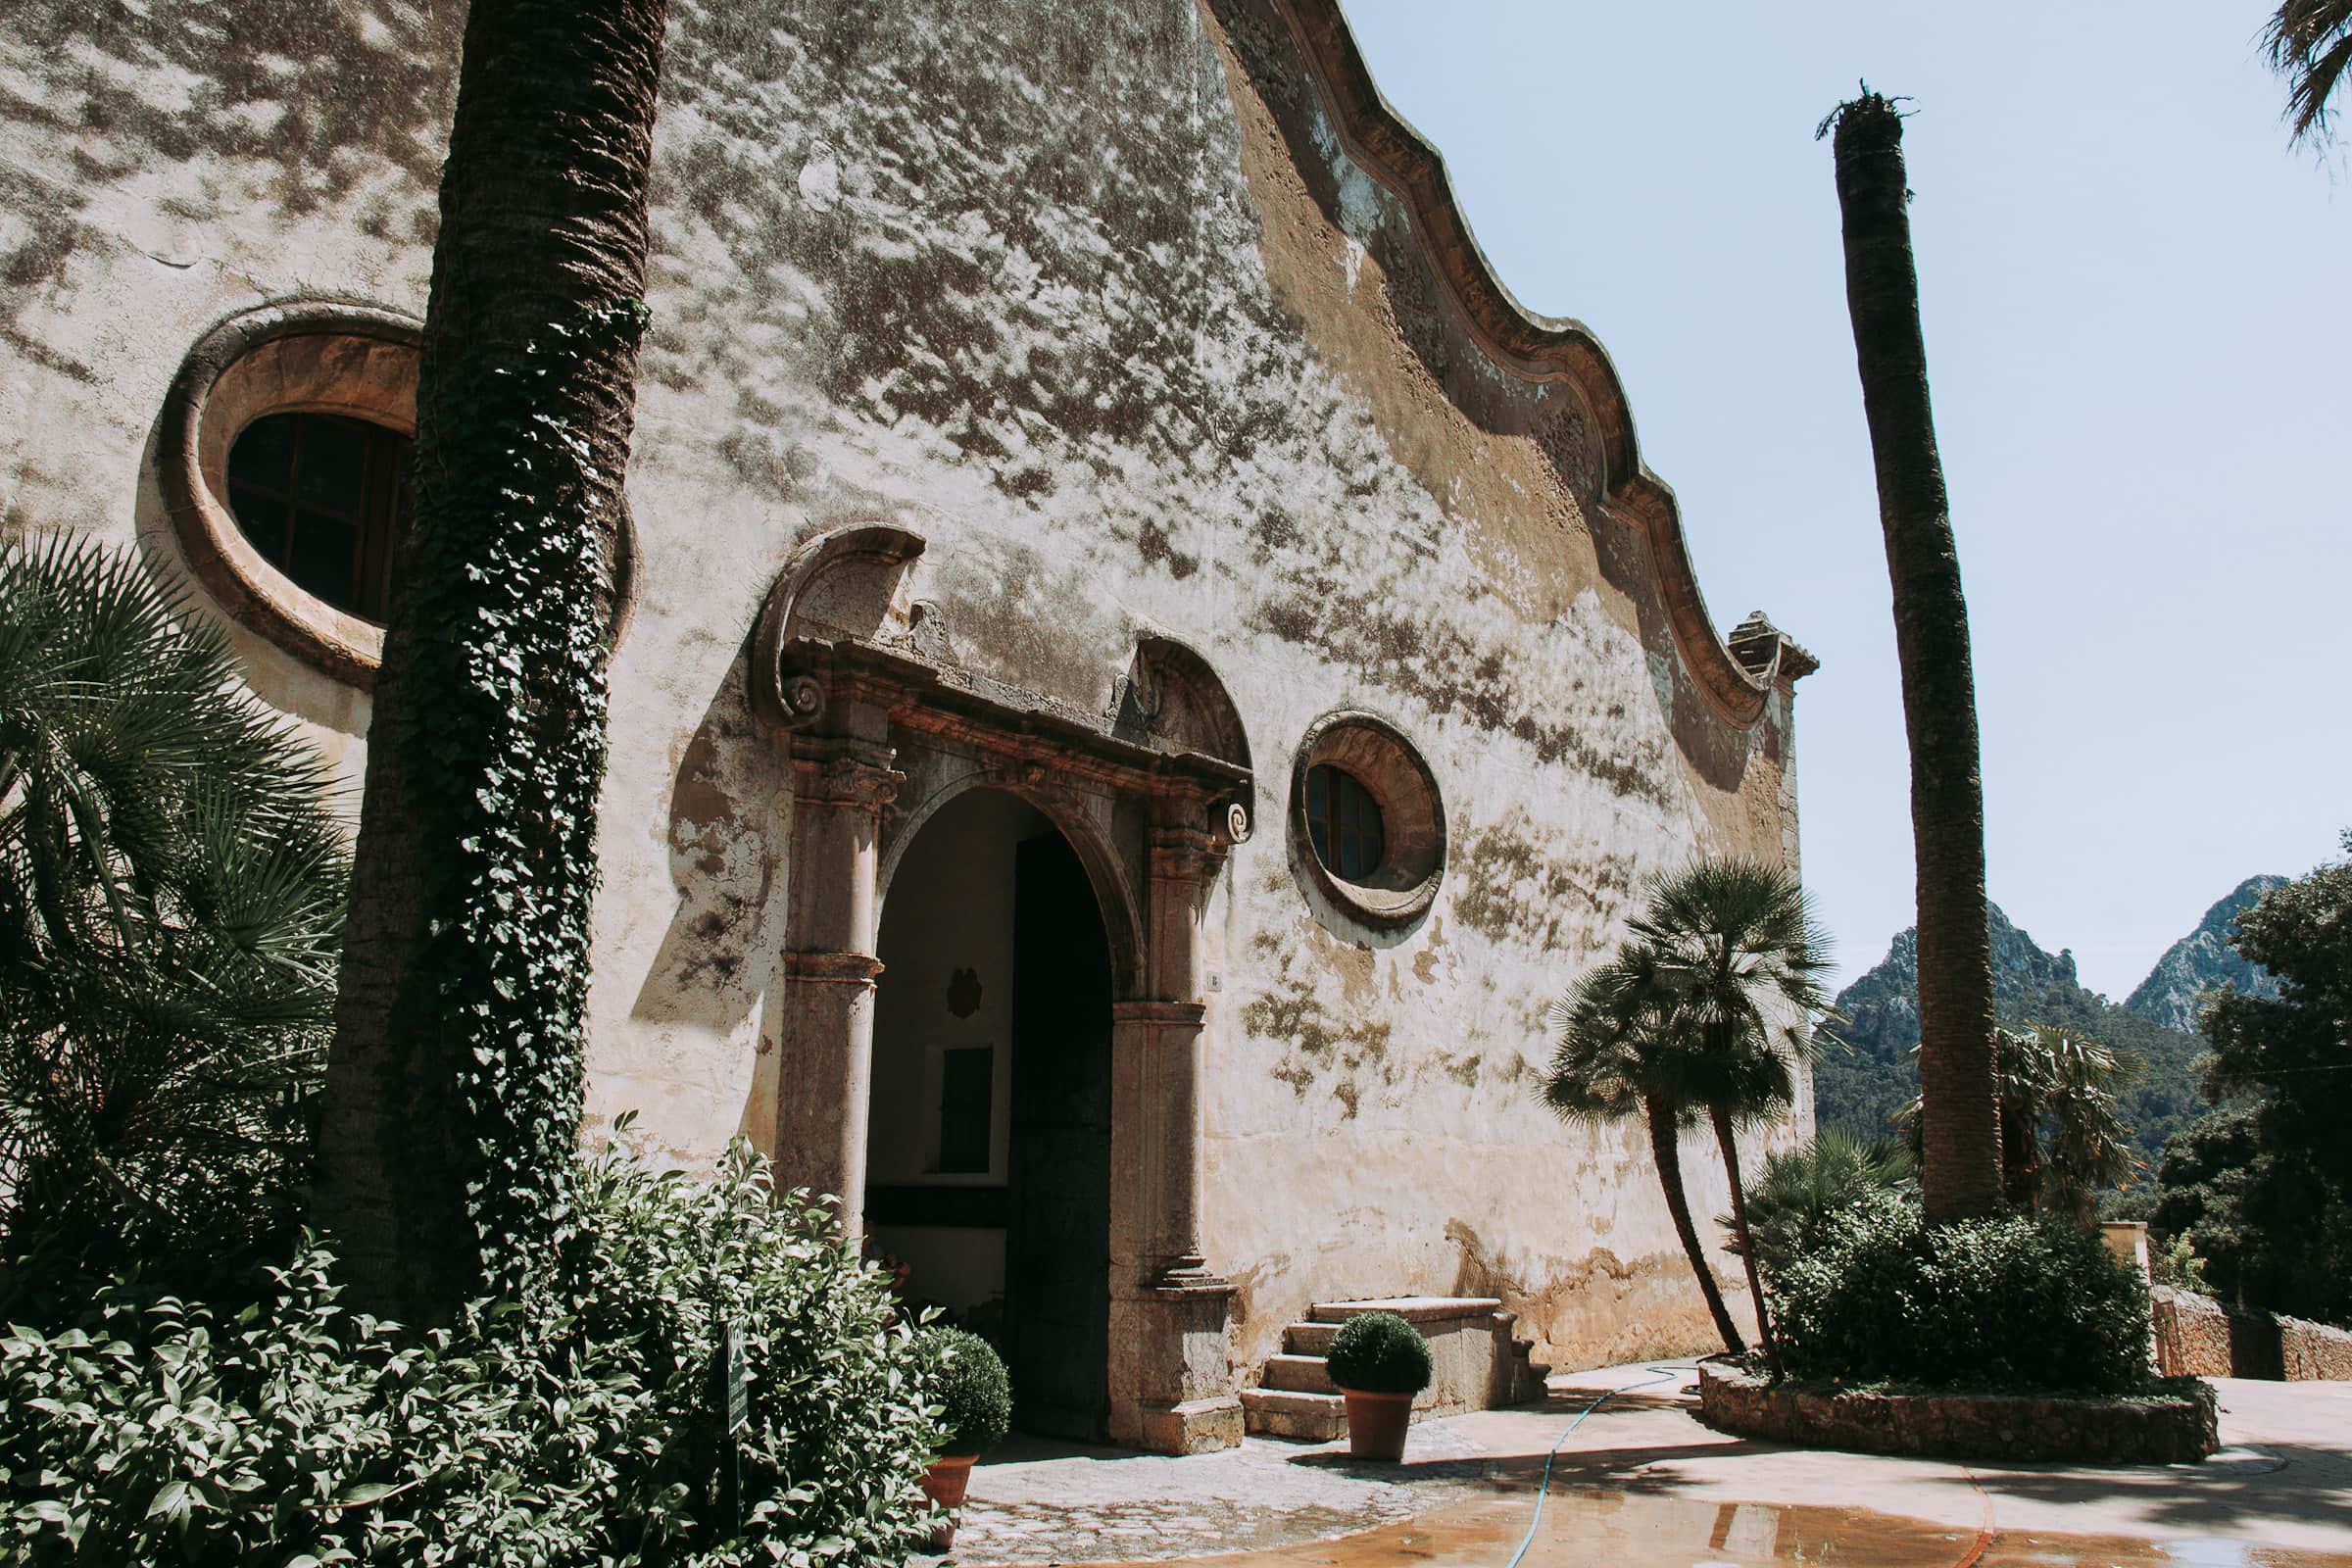 Jardines de Alfabia in Mallorca: Enjoy this tropical oasis! 1